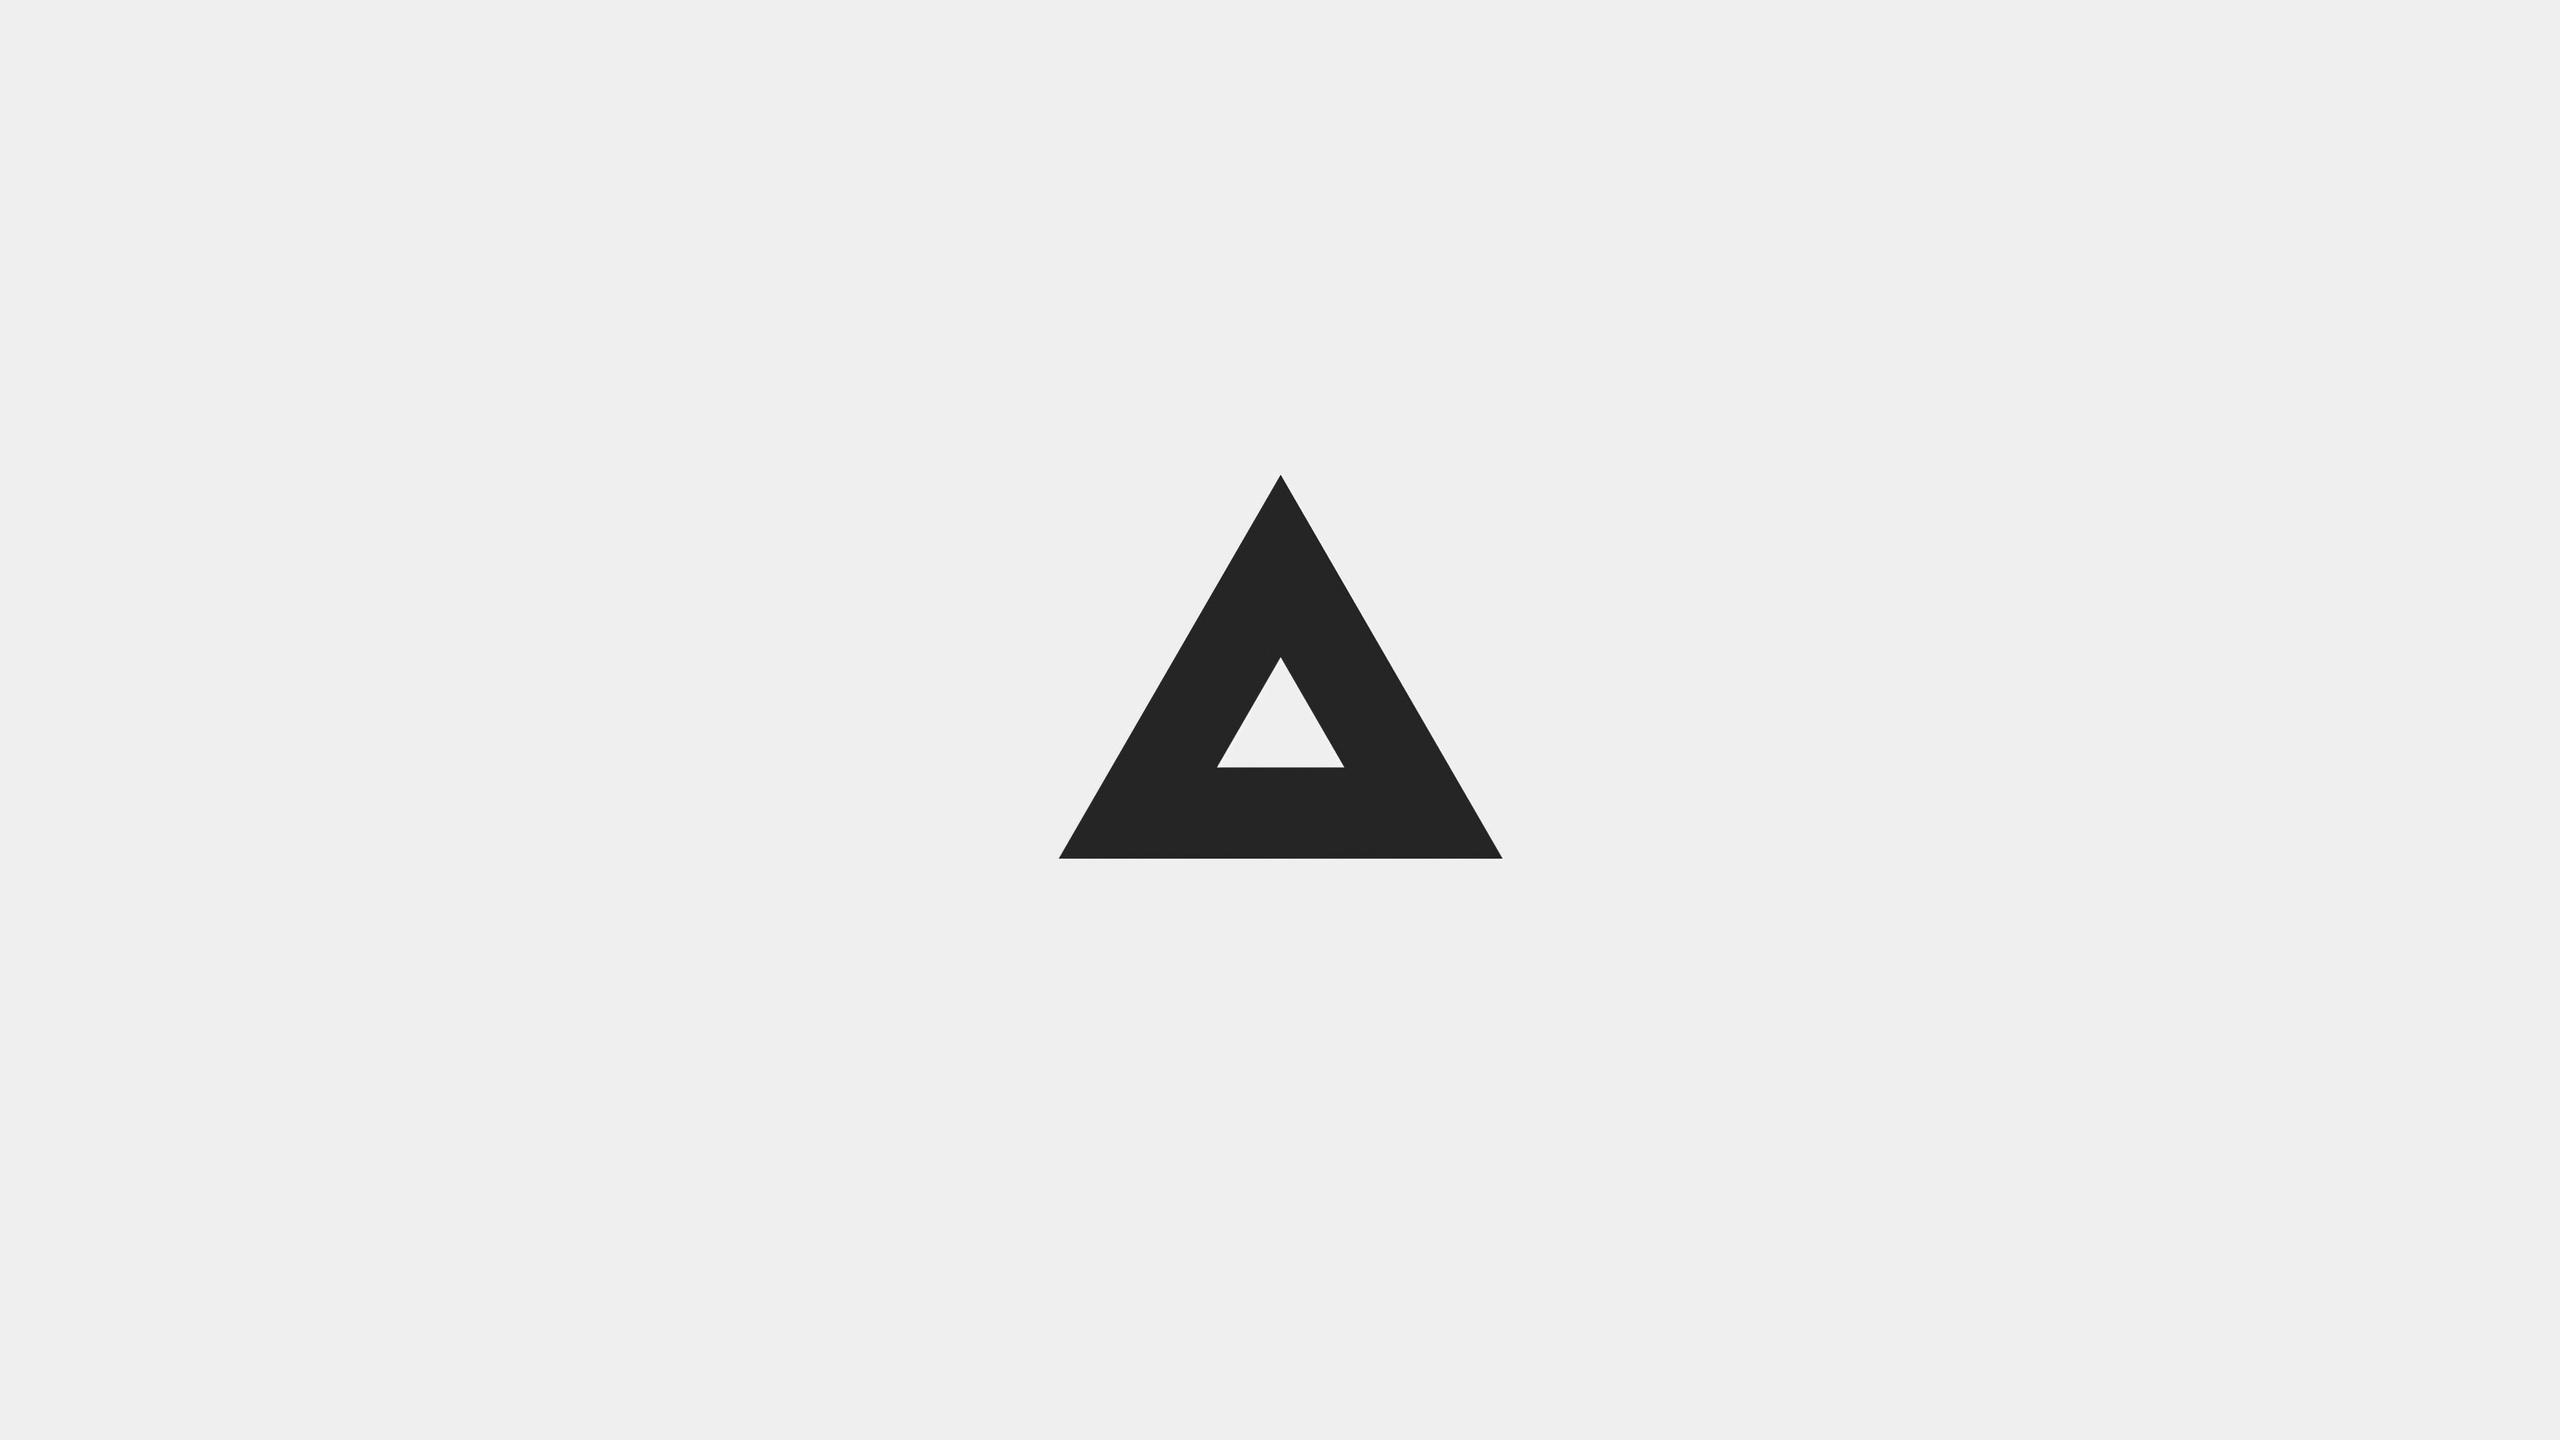 2560x1440 Minimal Triangle White Background 4k 1440P ...